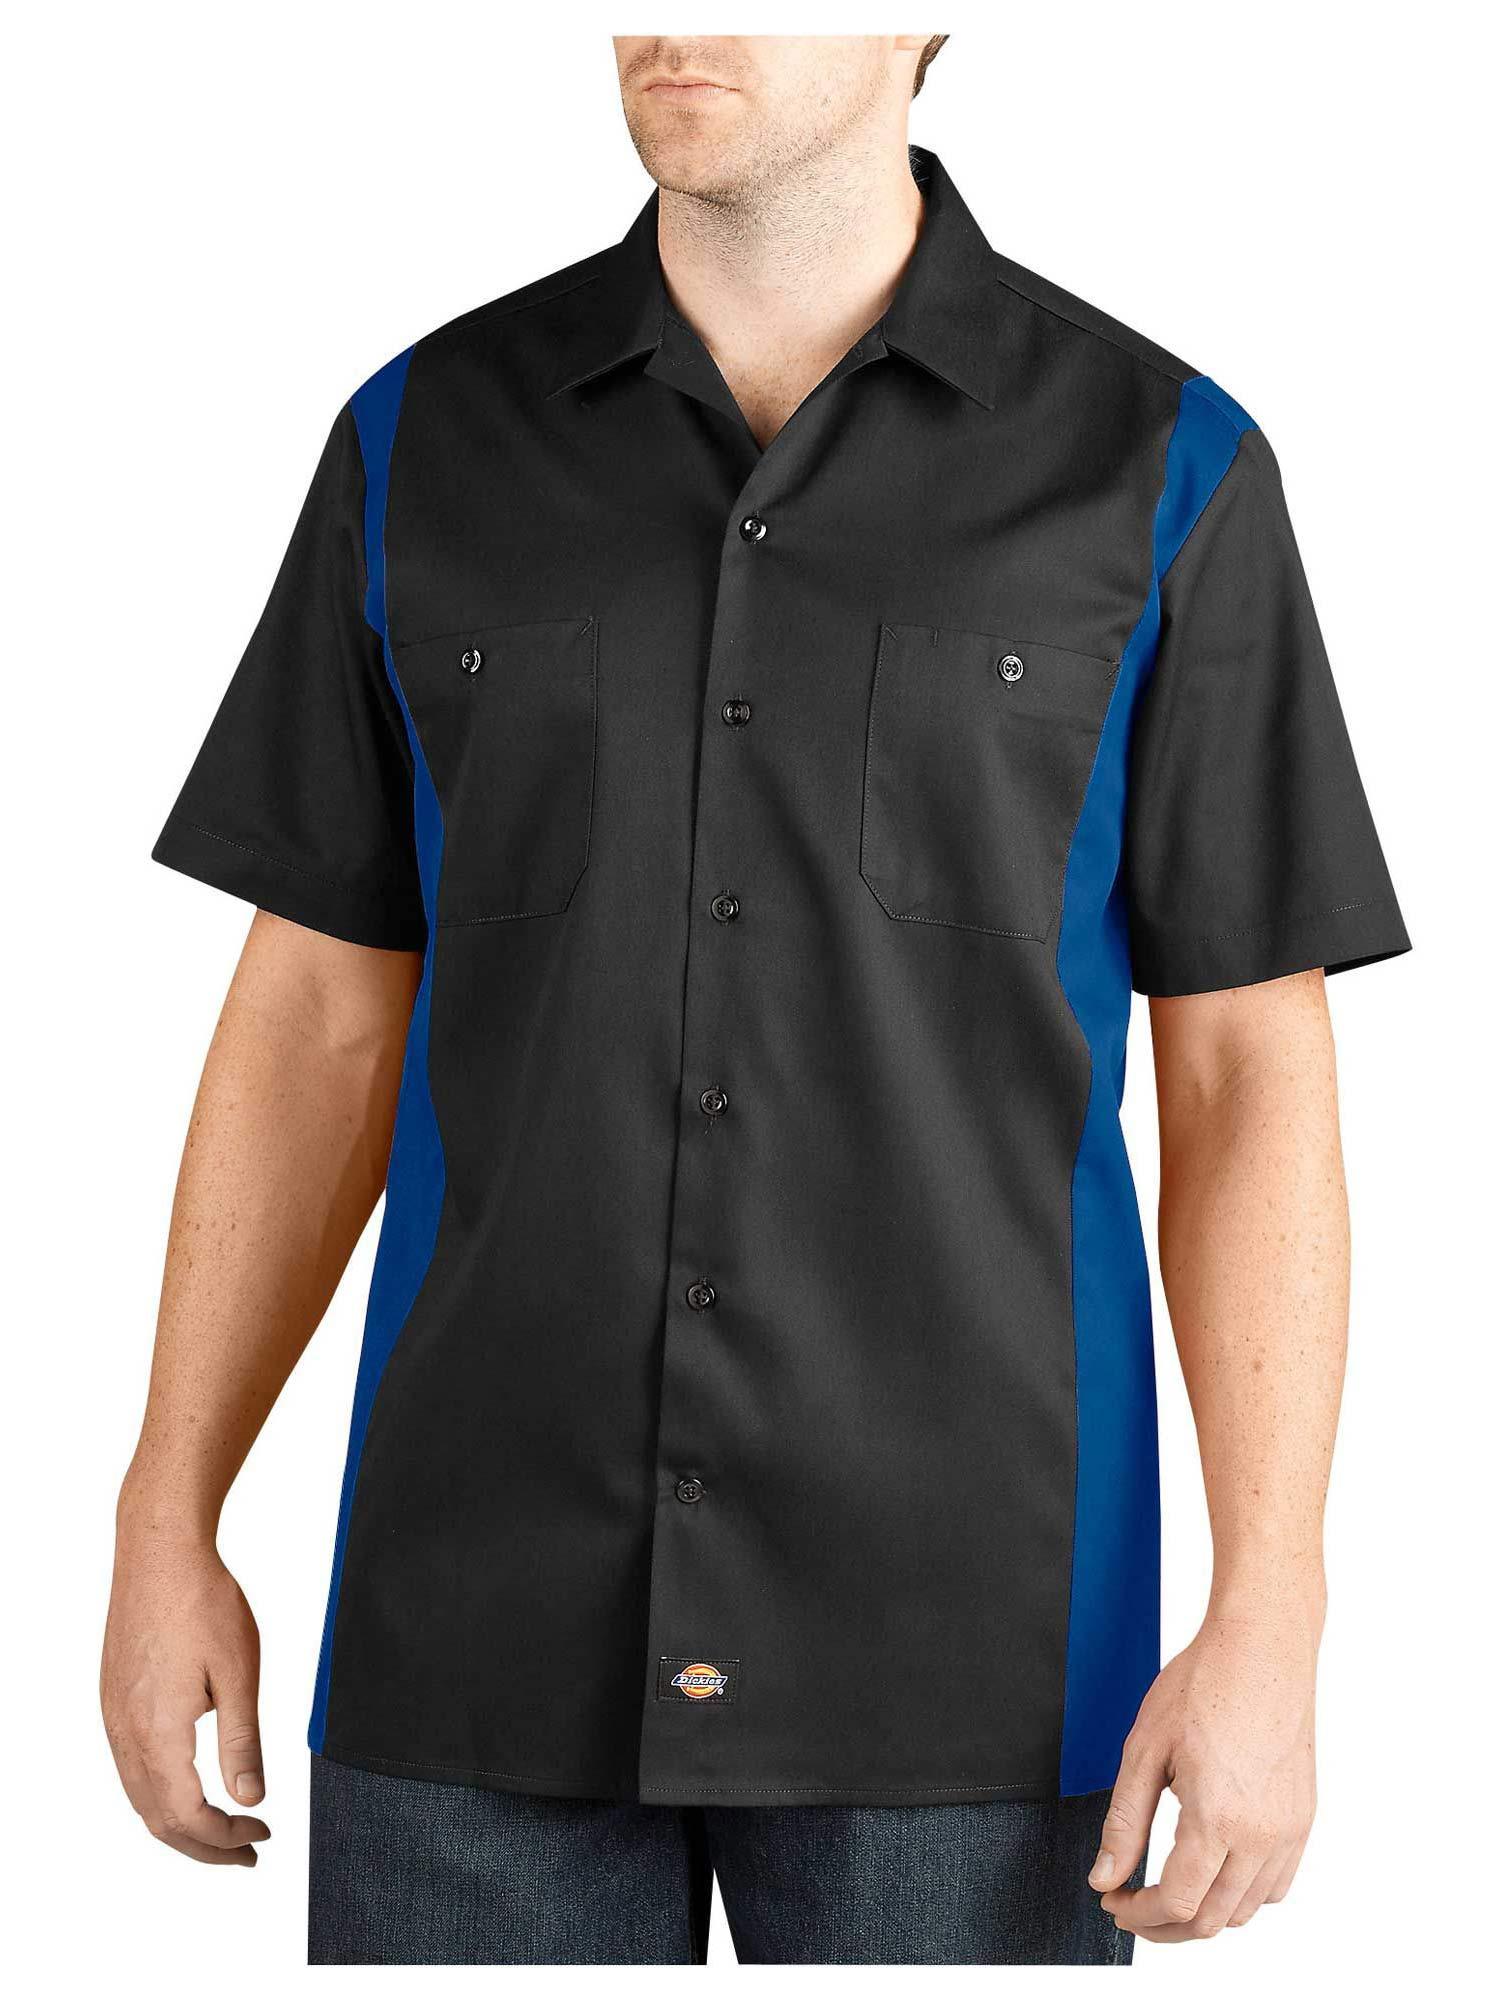 Dickies regular fit two tone work shirt ws508 for 6 dollar shirts coupon code free shipping